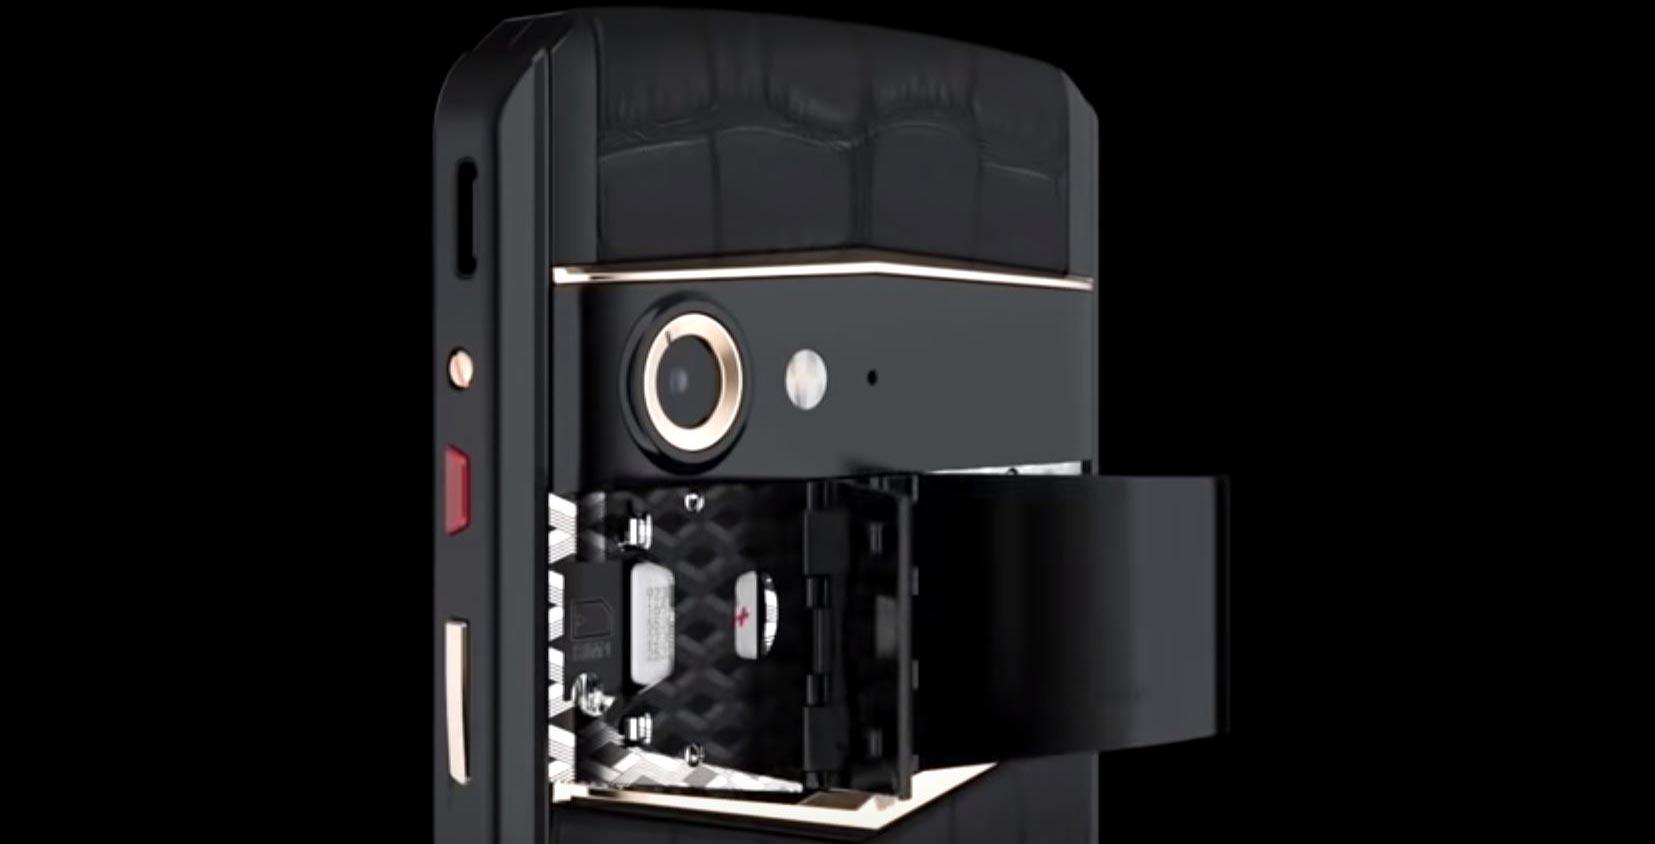 Vertu has unveiled its new smartphone